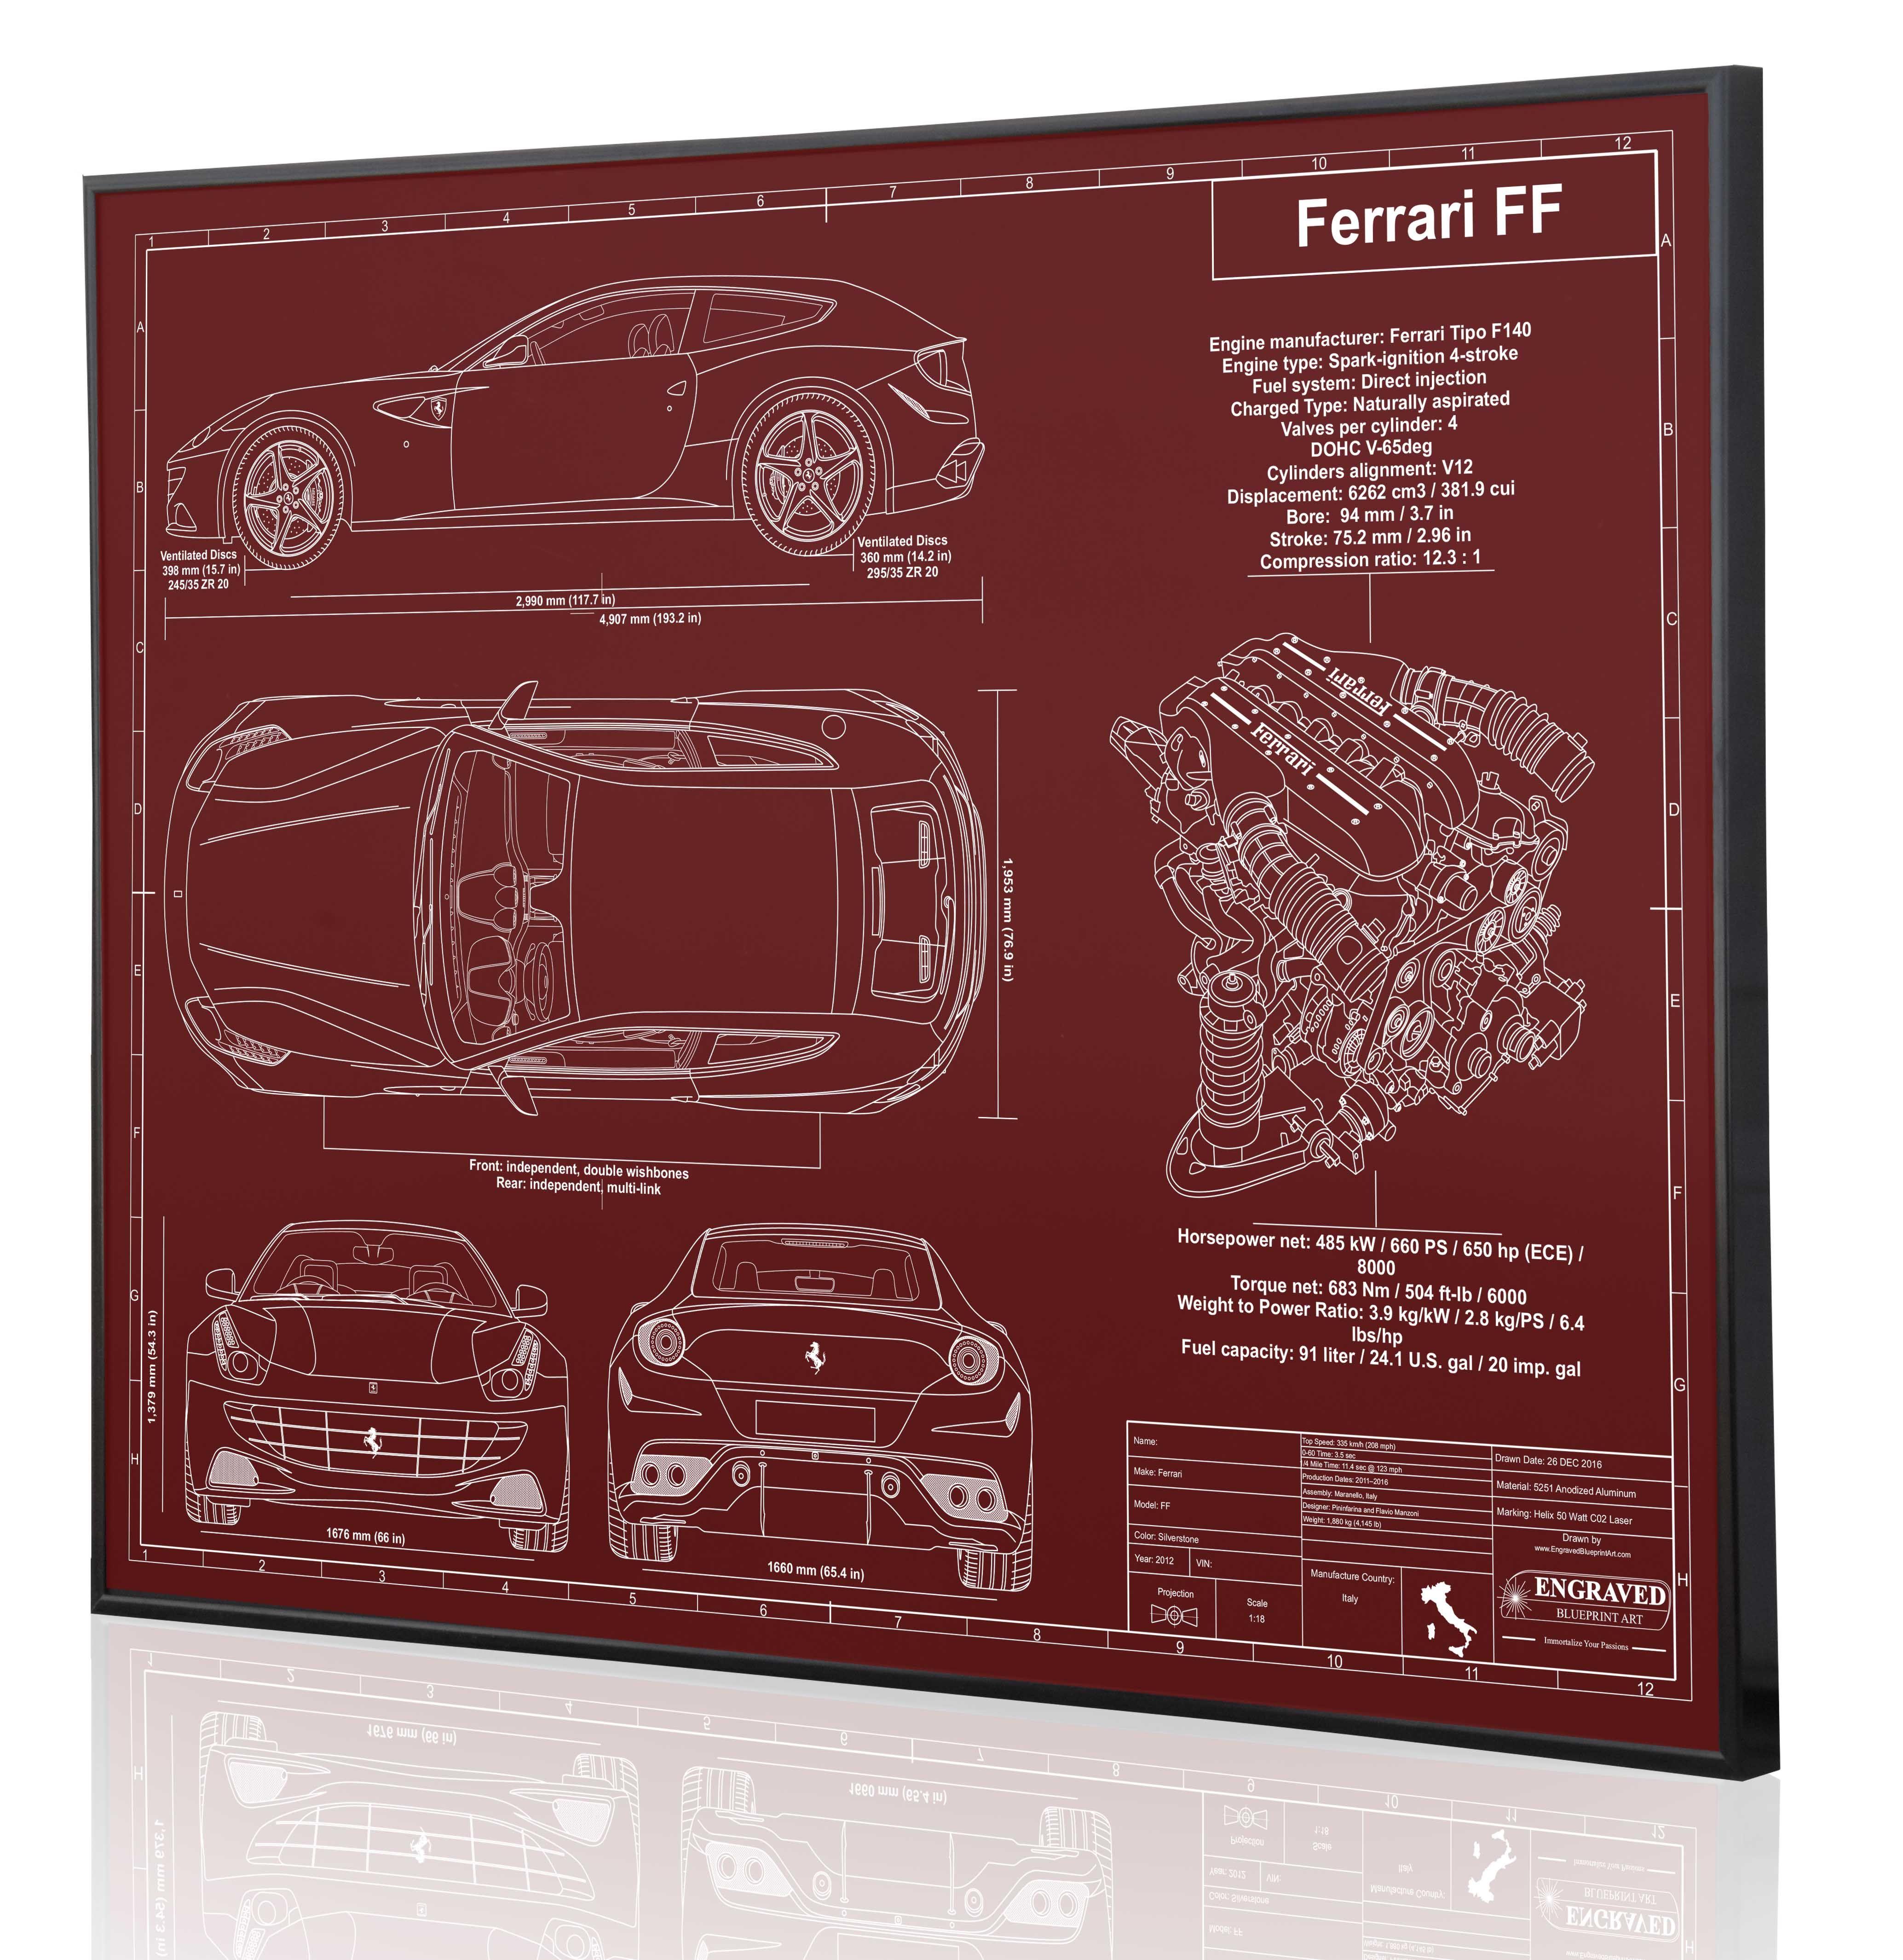 Ferrari ff laser engraved blueprint artwork imoroatilize your custom laser engraved blueprint artwork cars planes ships more malvernweather Gallery